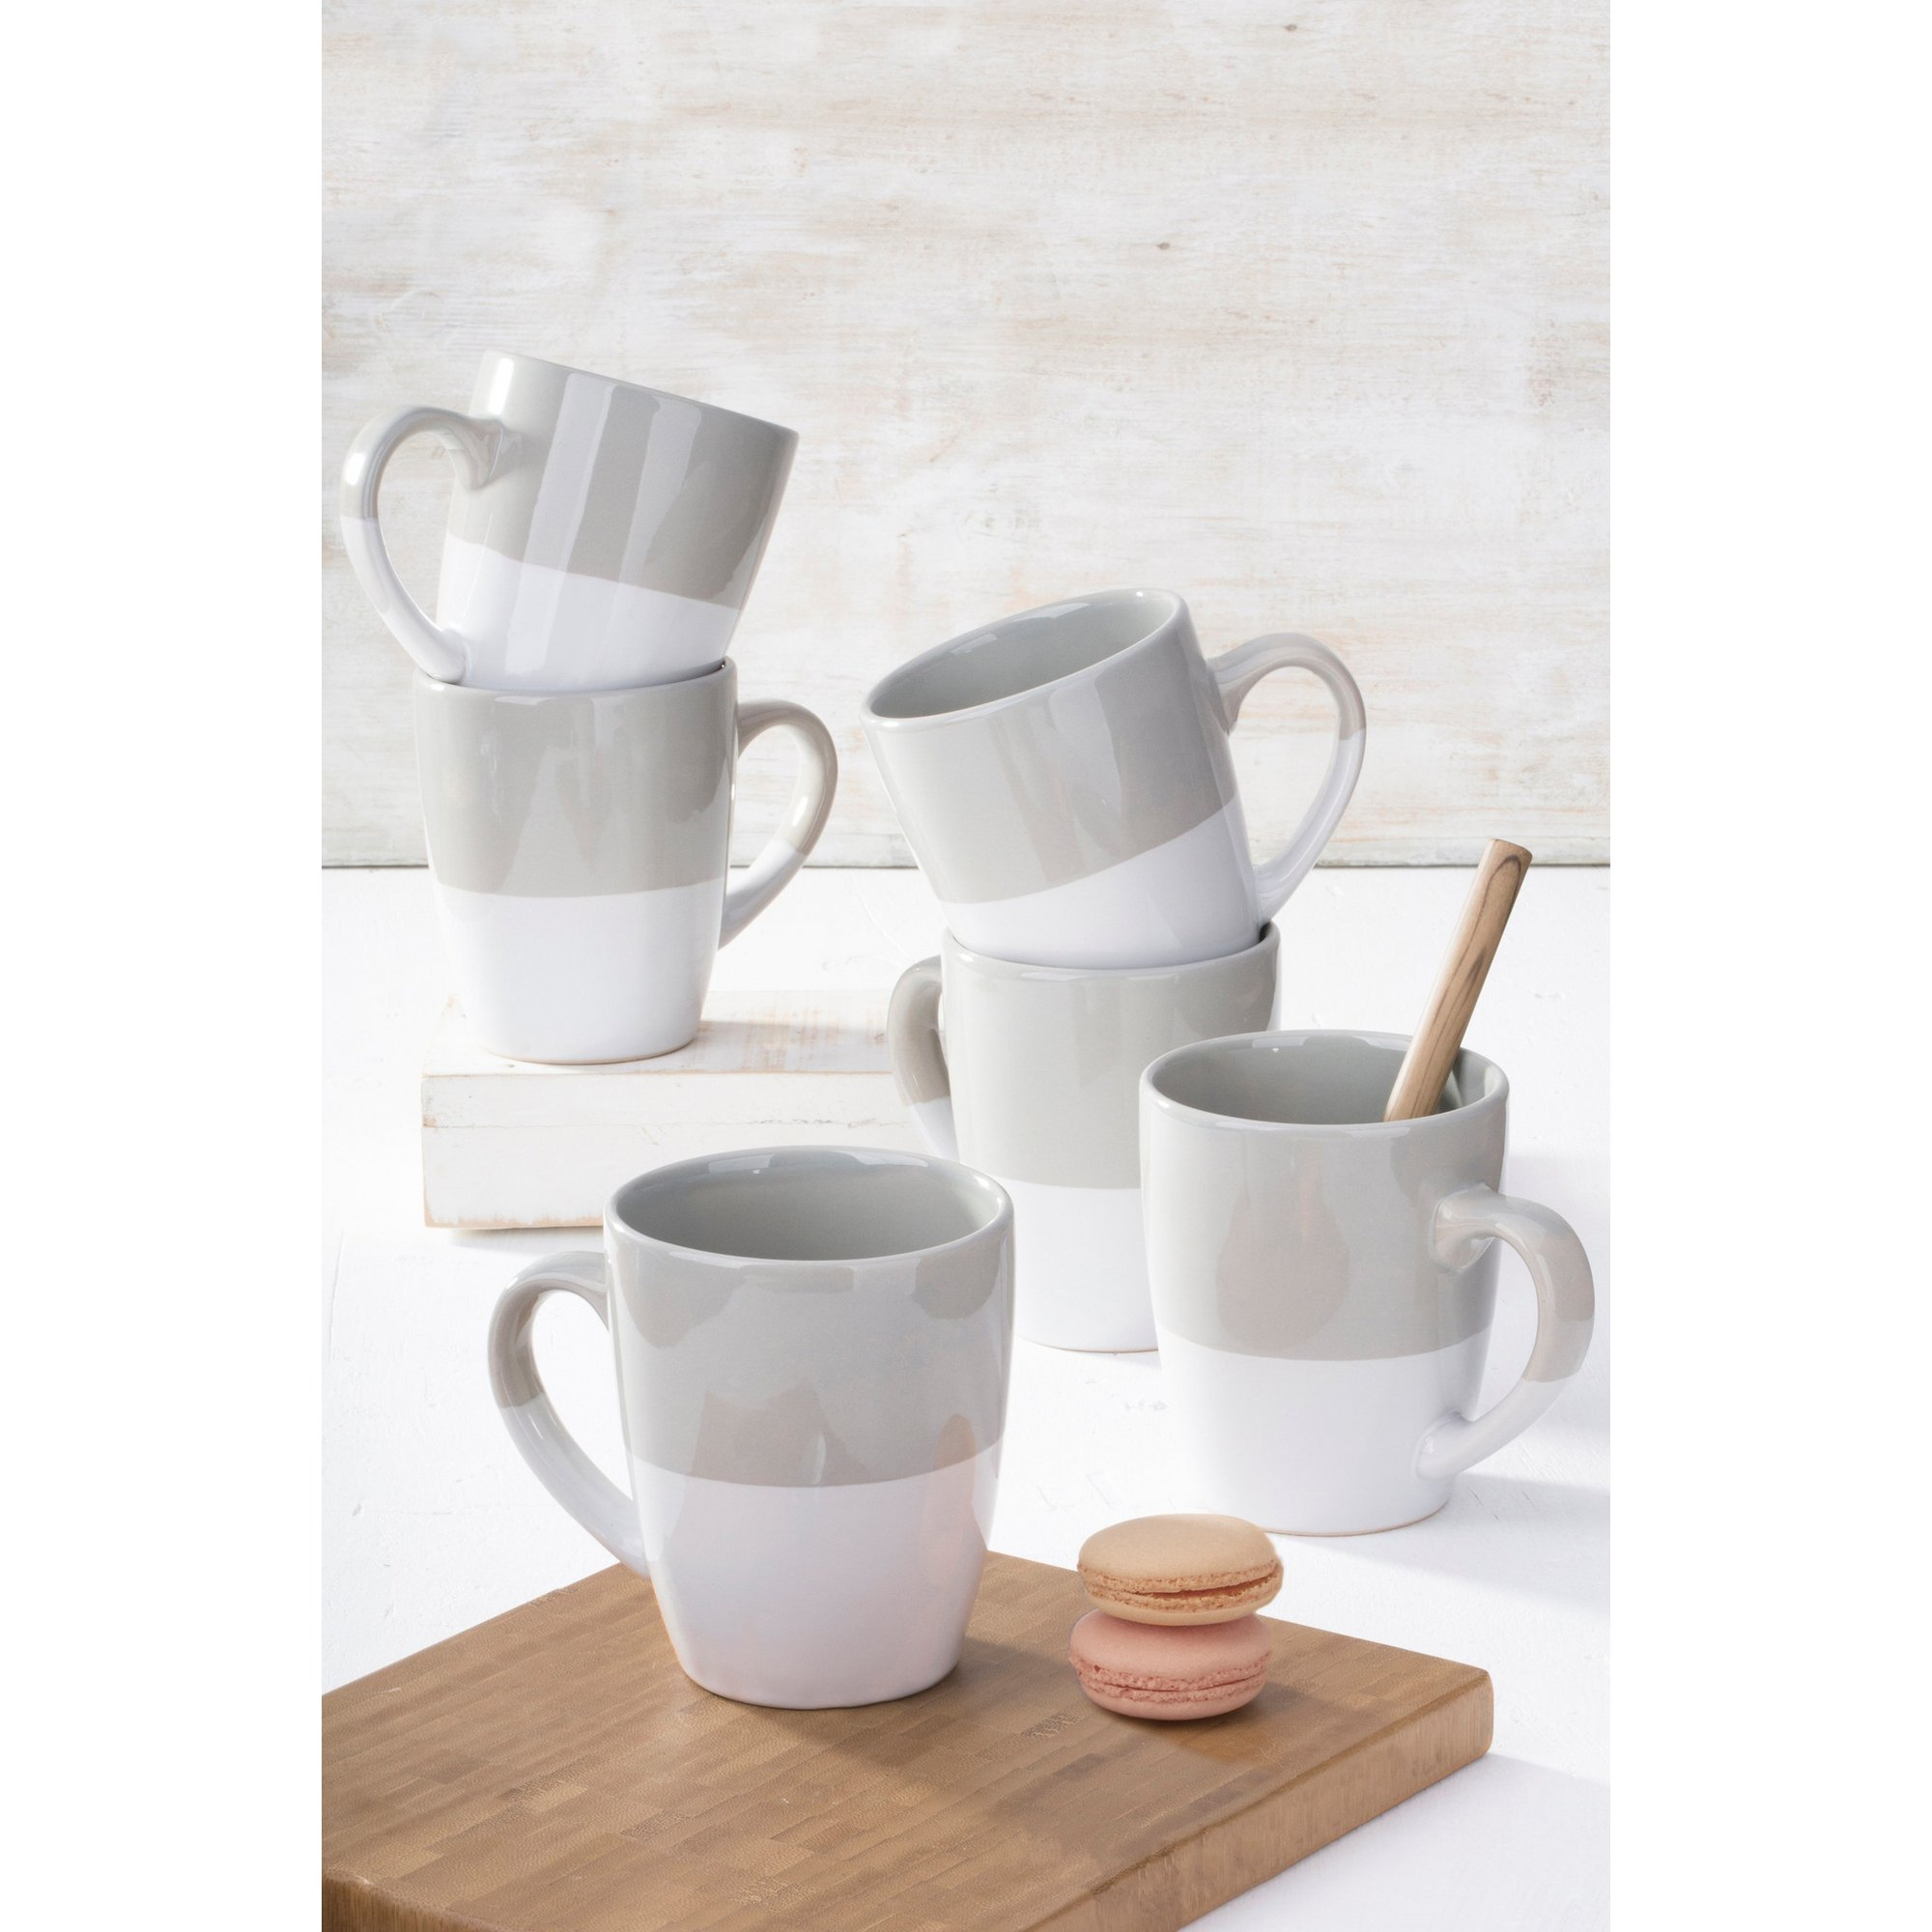 Image of 6-Piece Grey Dipped Glaze Mug Set